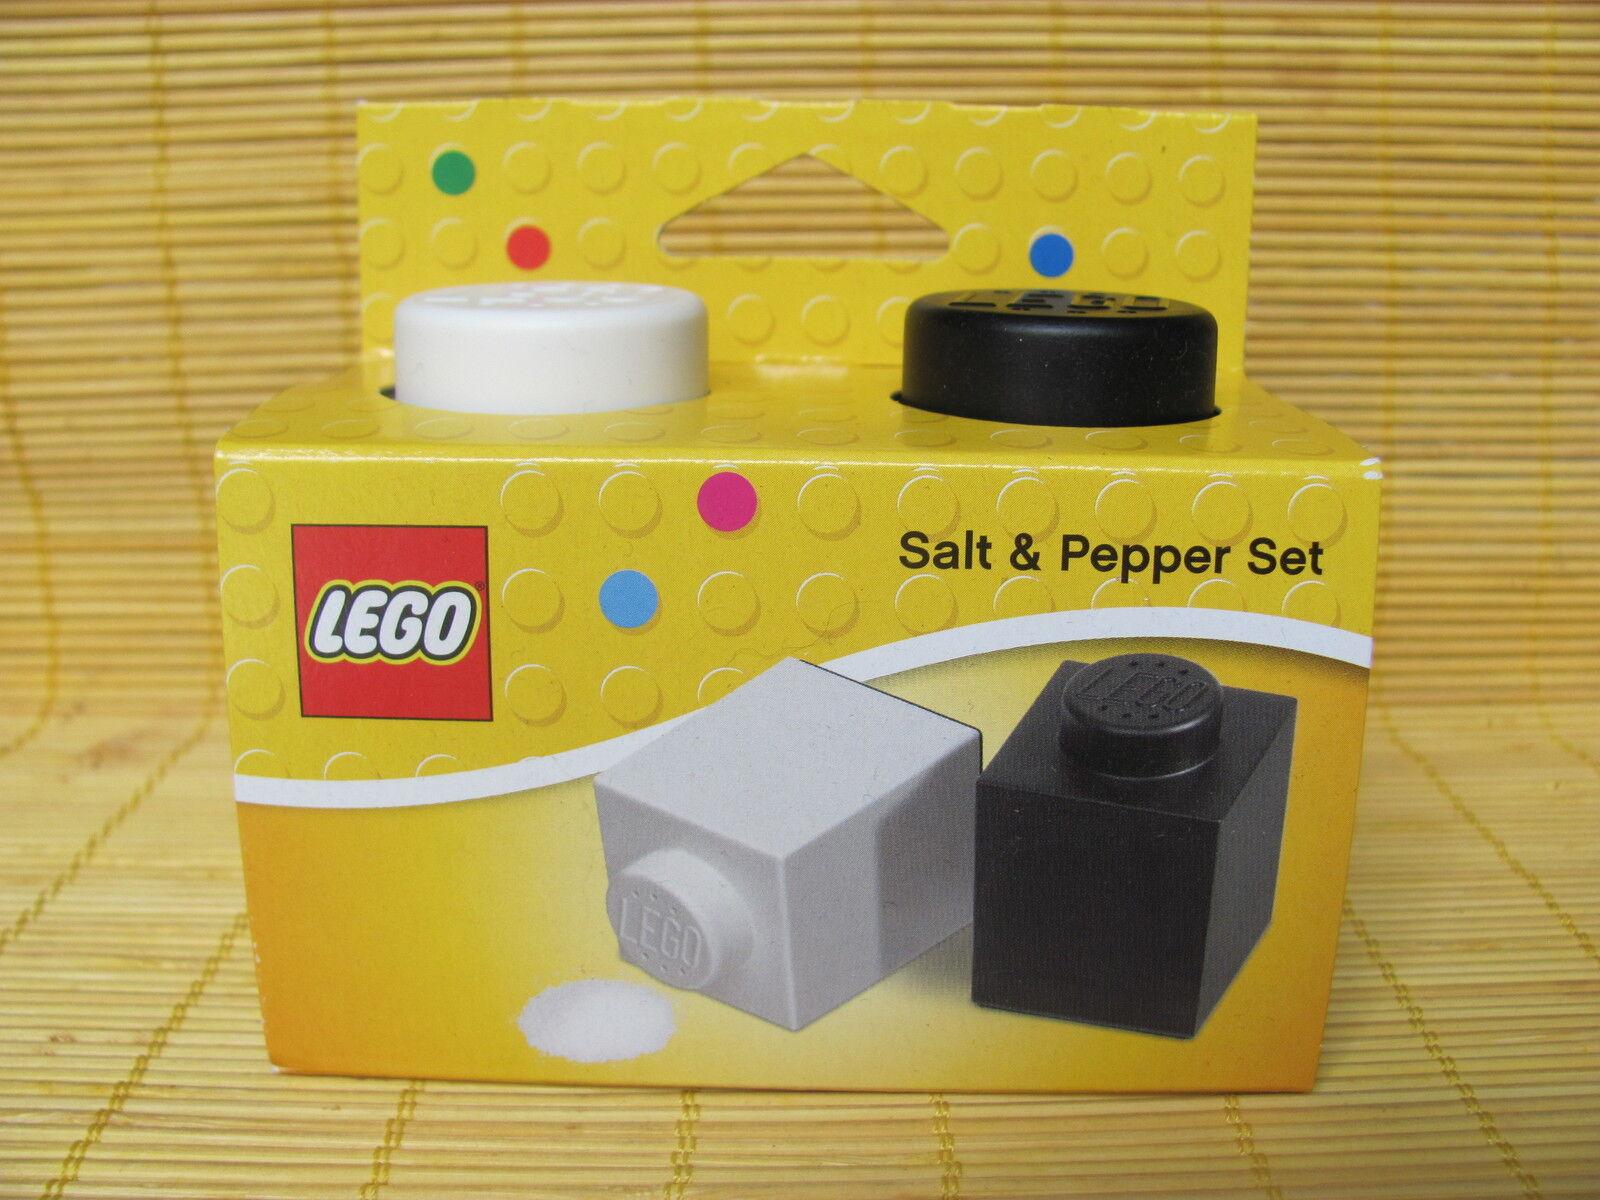 Lego - Salz- und Pfefferstreuer  Salt & Pepper Set - Lego Tolles Geschenk  Neu u. OVP 06c504